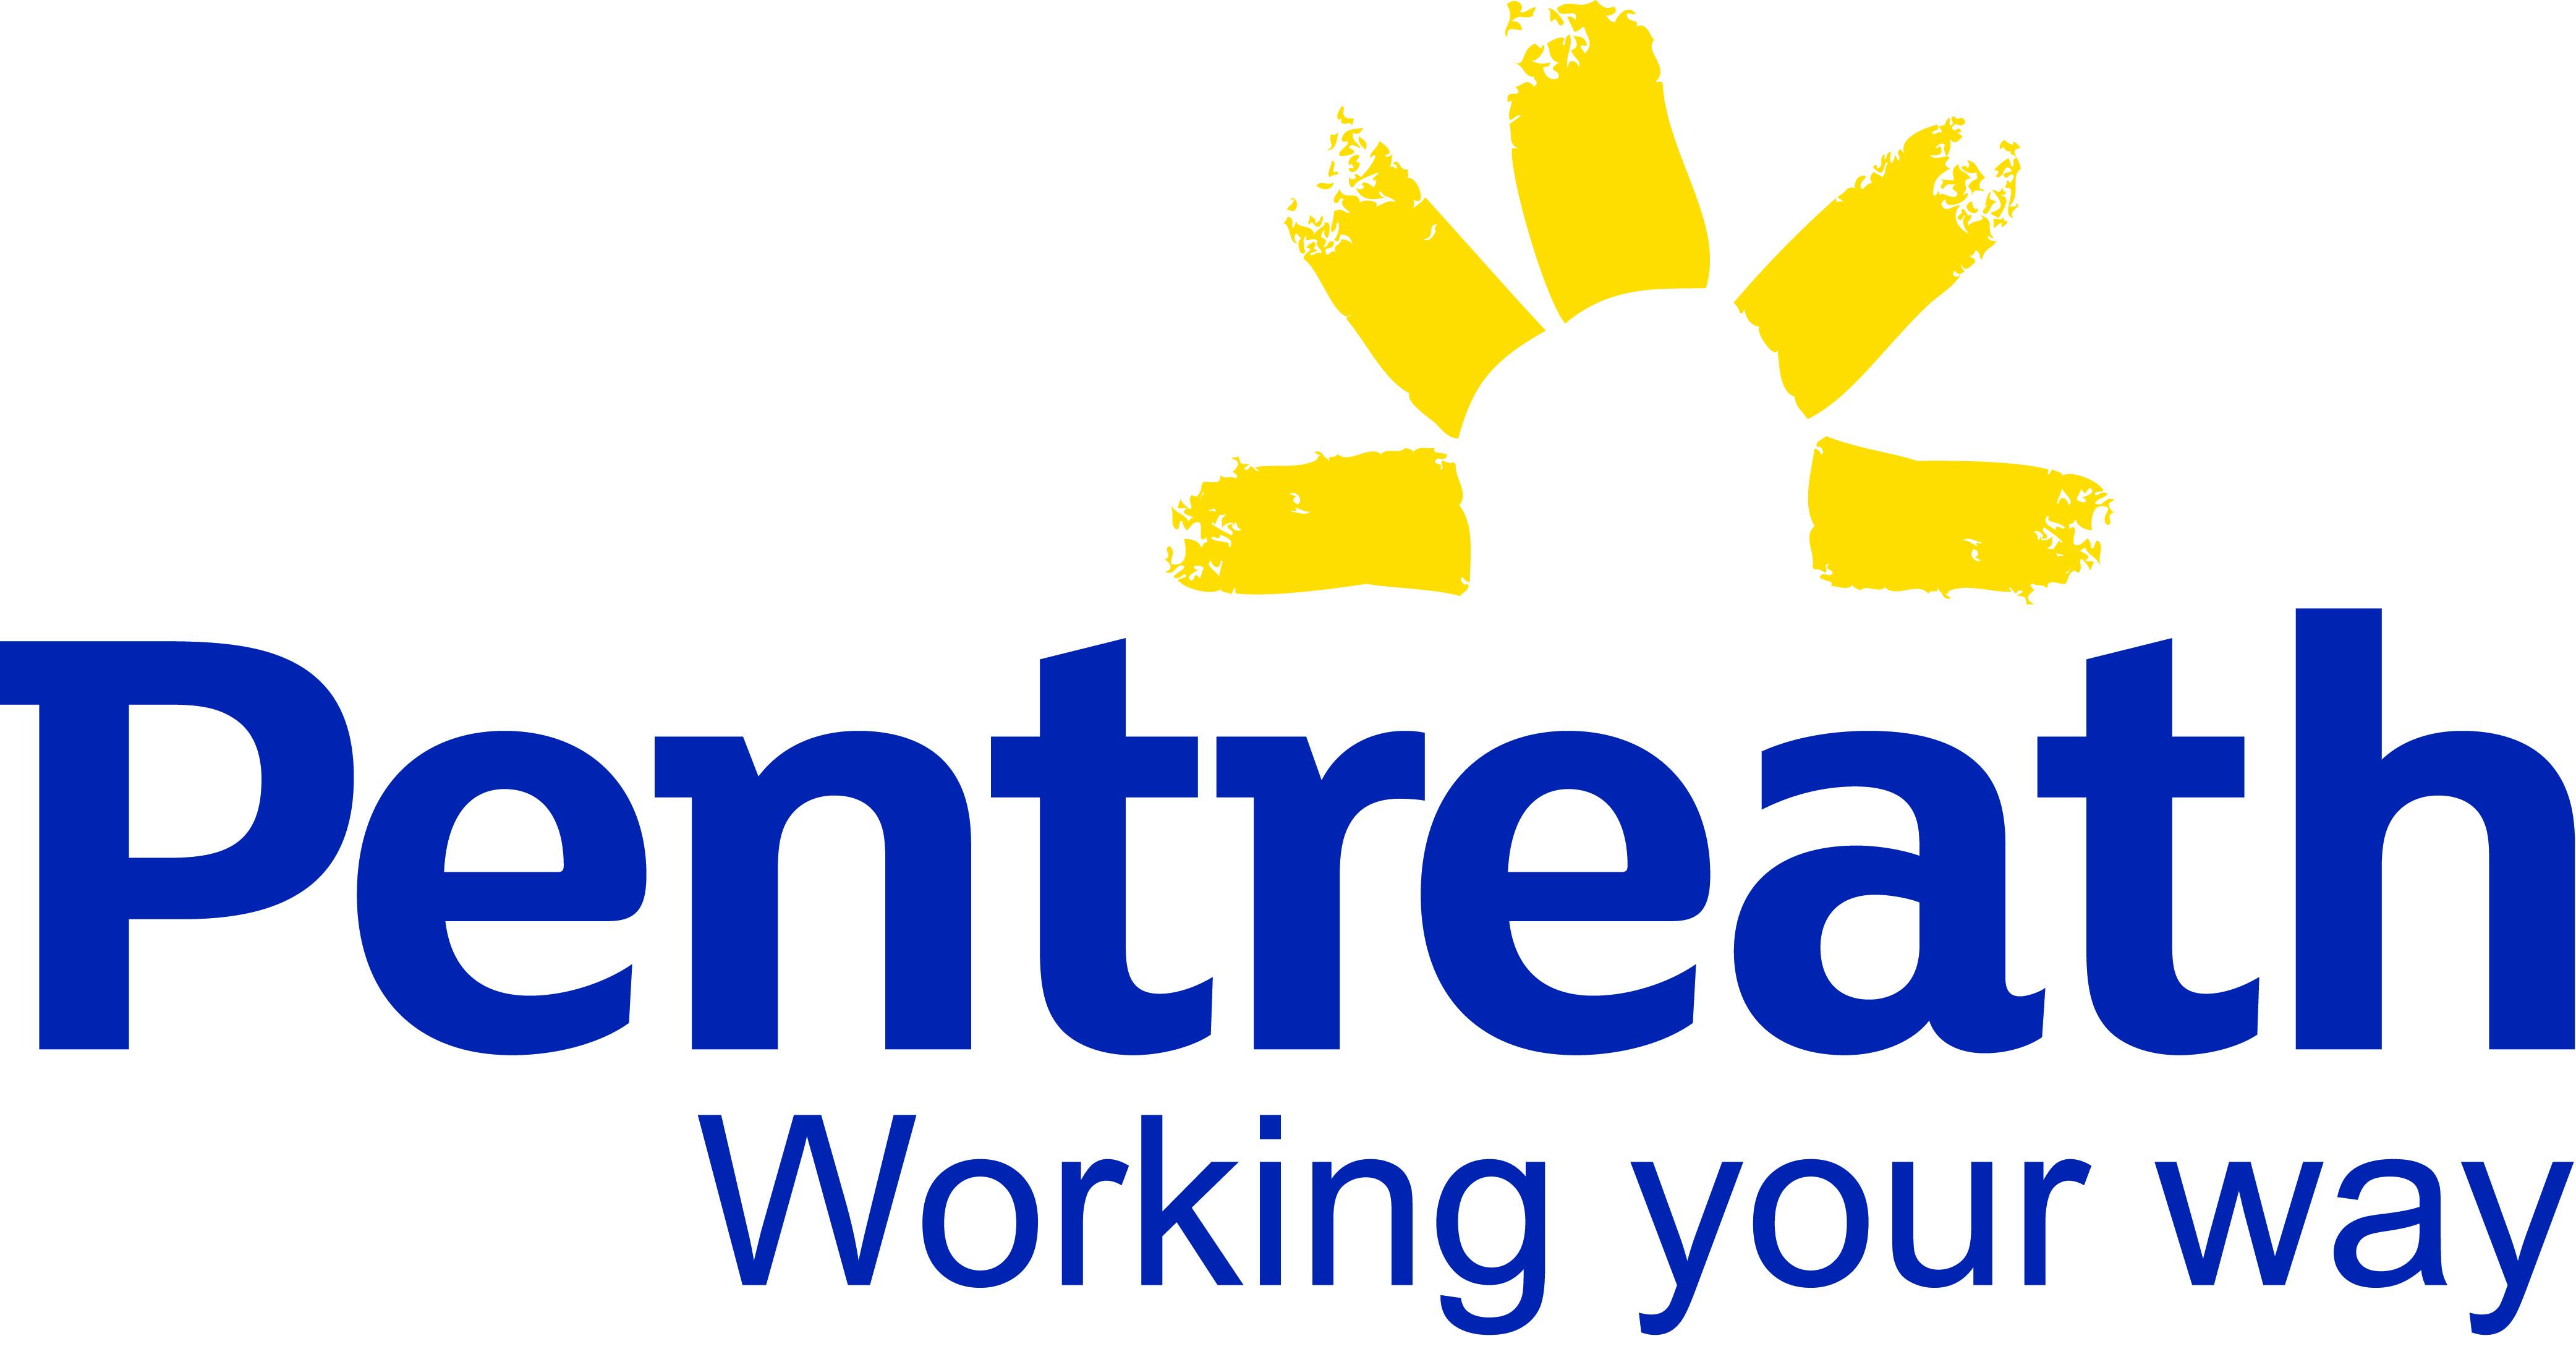 Pentreath Ltd